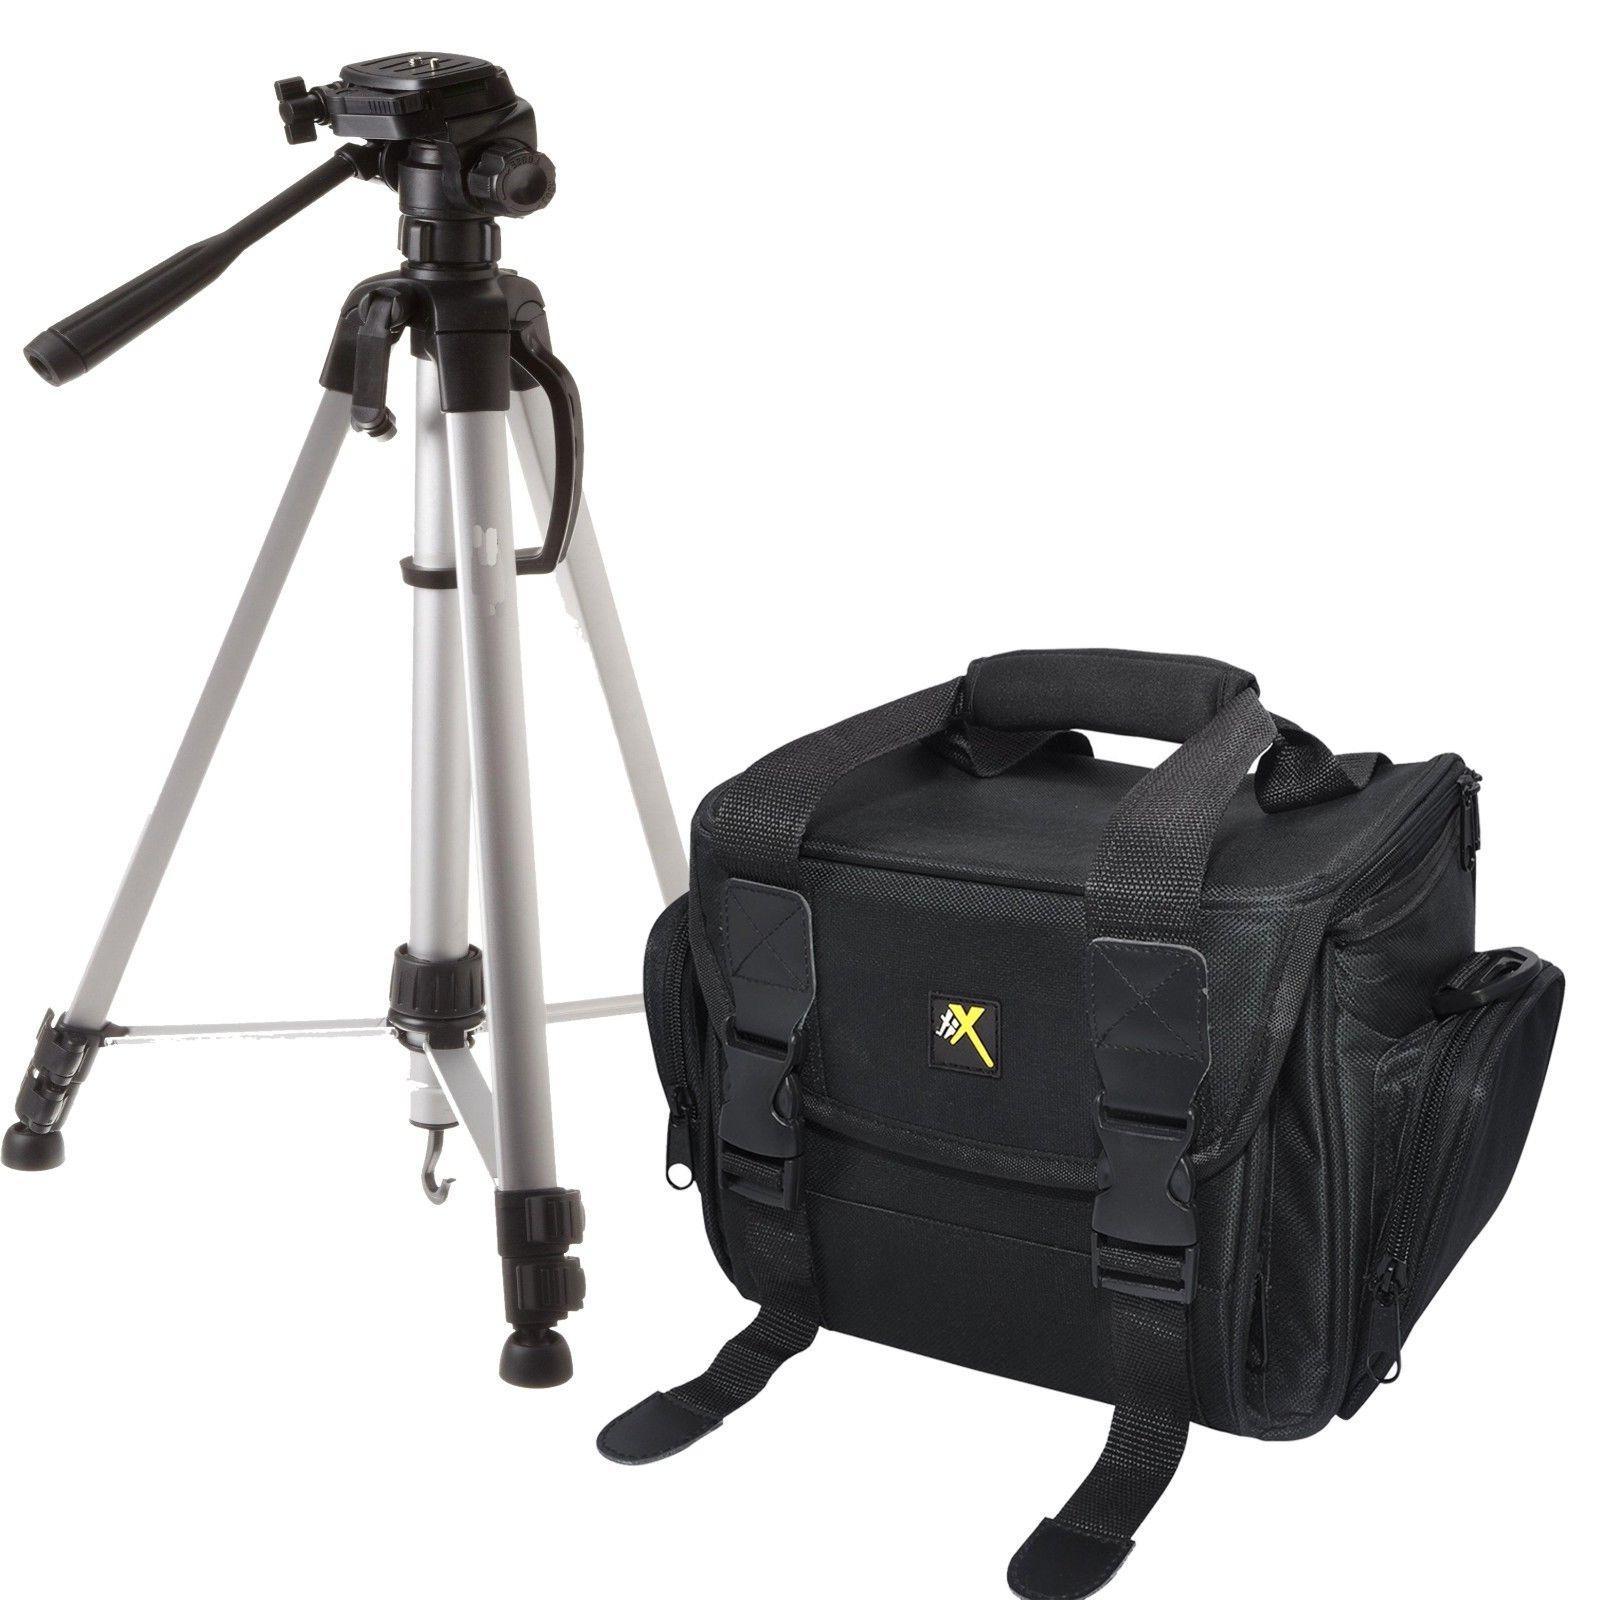 Nikon D3500 Camera 18-55mm VR Lens Bundle More